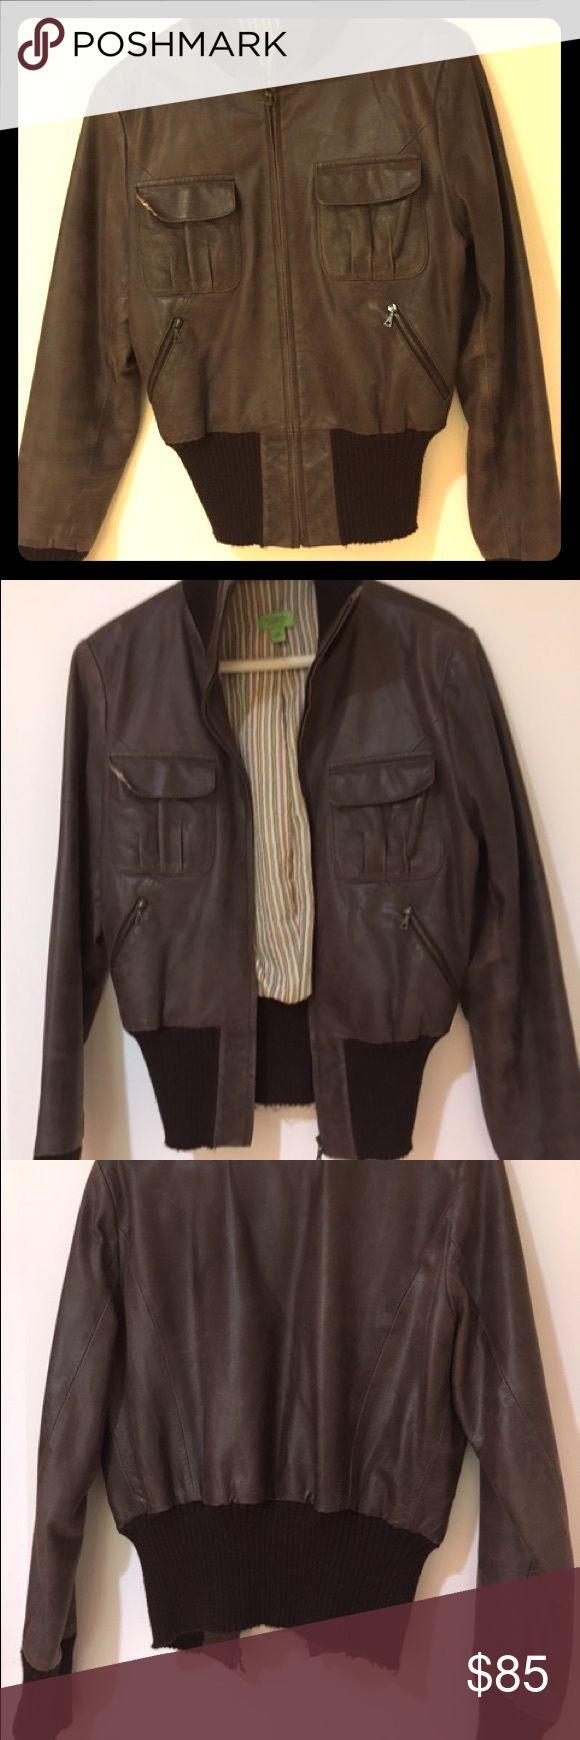 John Carlisle brown leather bomber jacket John Carlisle distressed chocolate brown leather bomber jacket with knit bottom and wrist. In great condition. John Carlisle Jackets & Coats